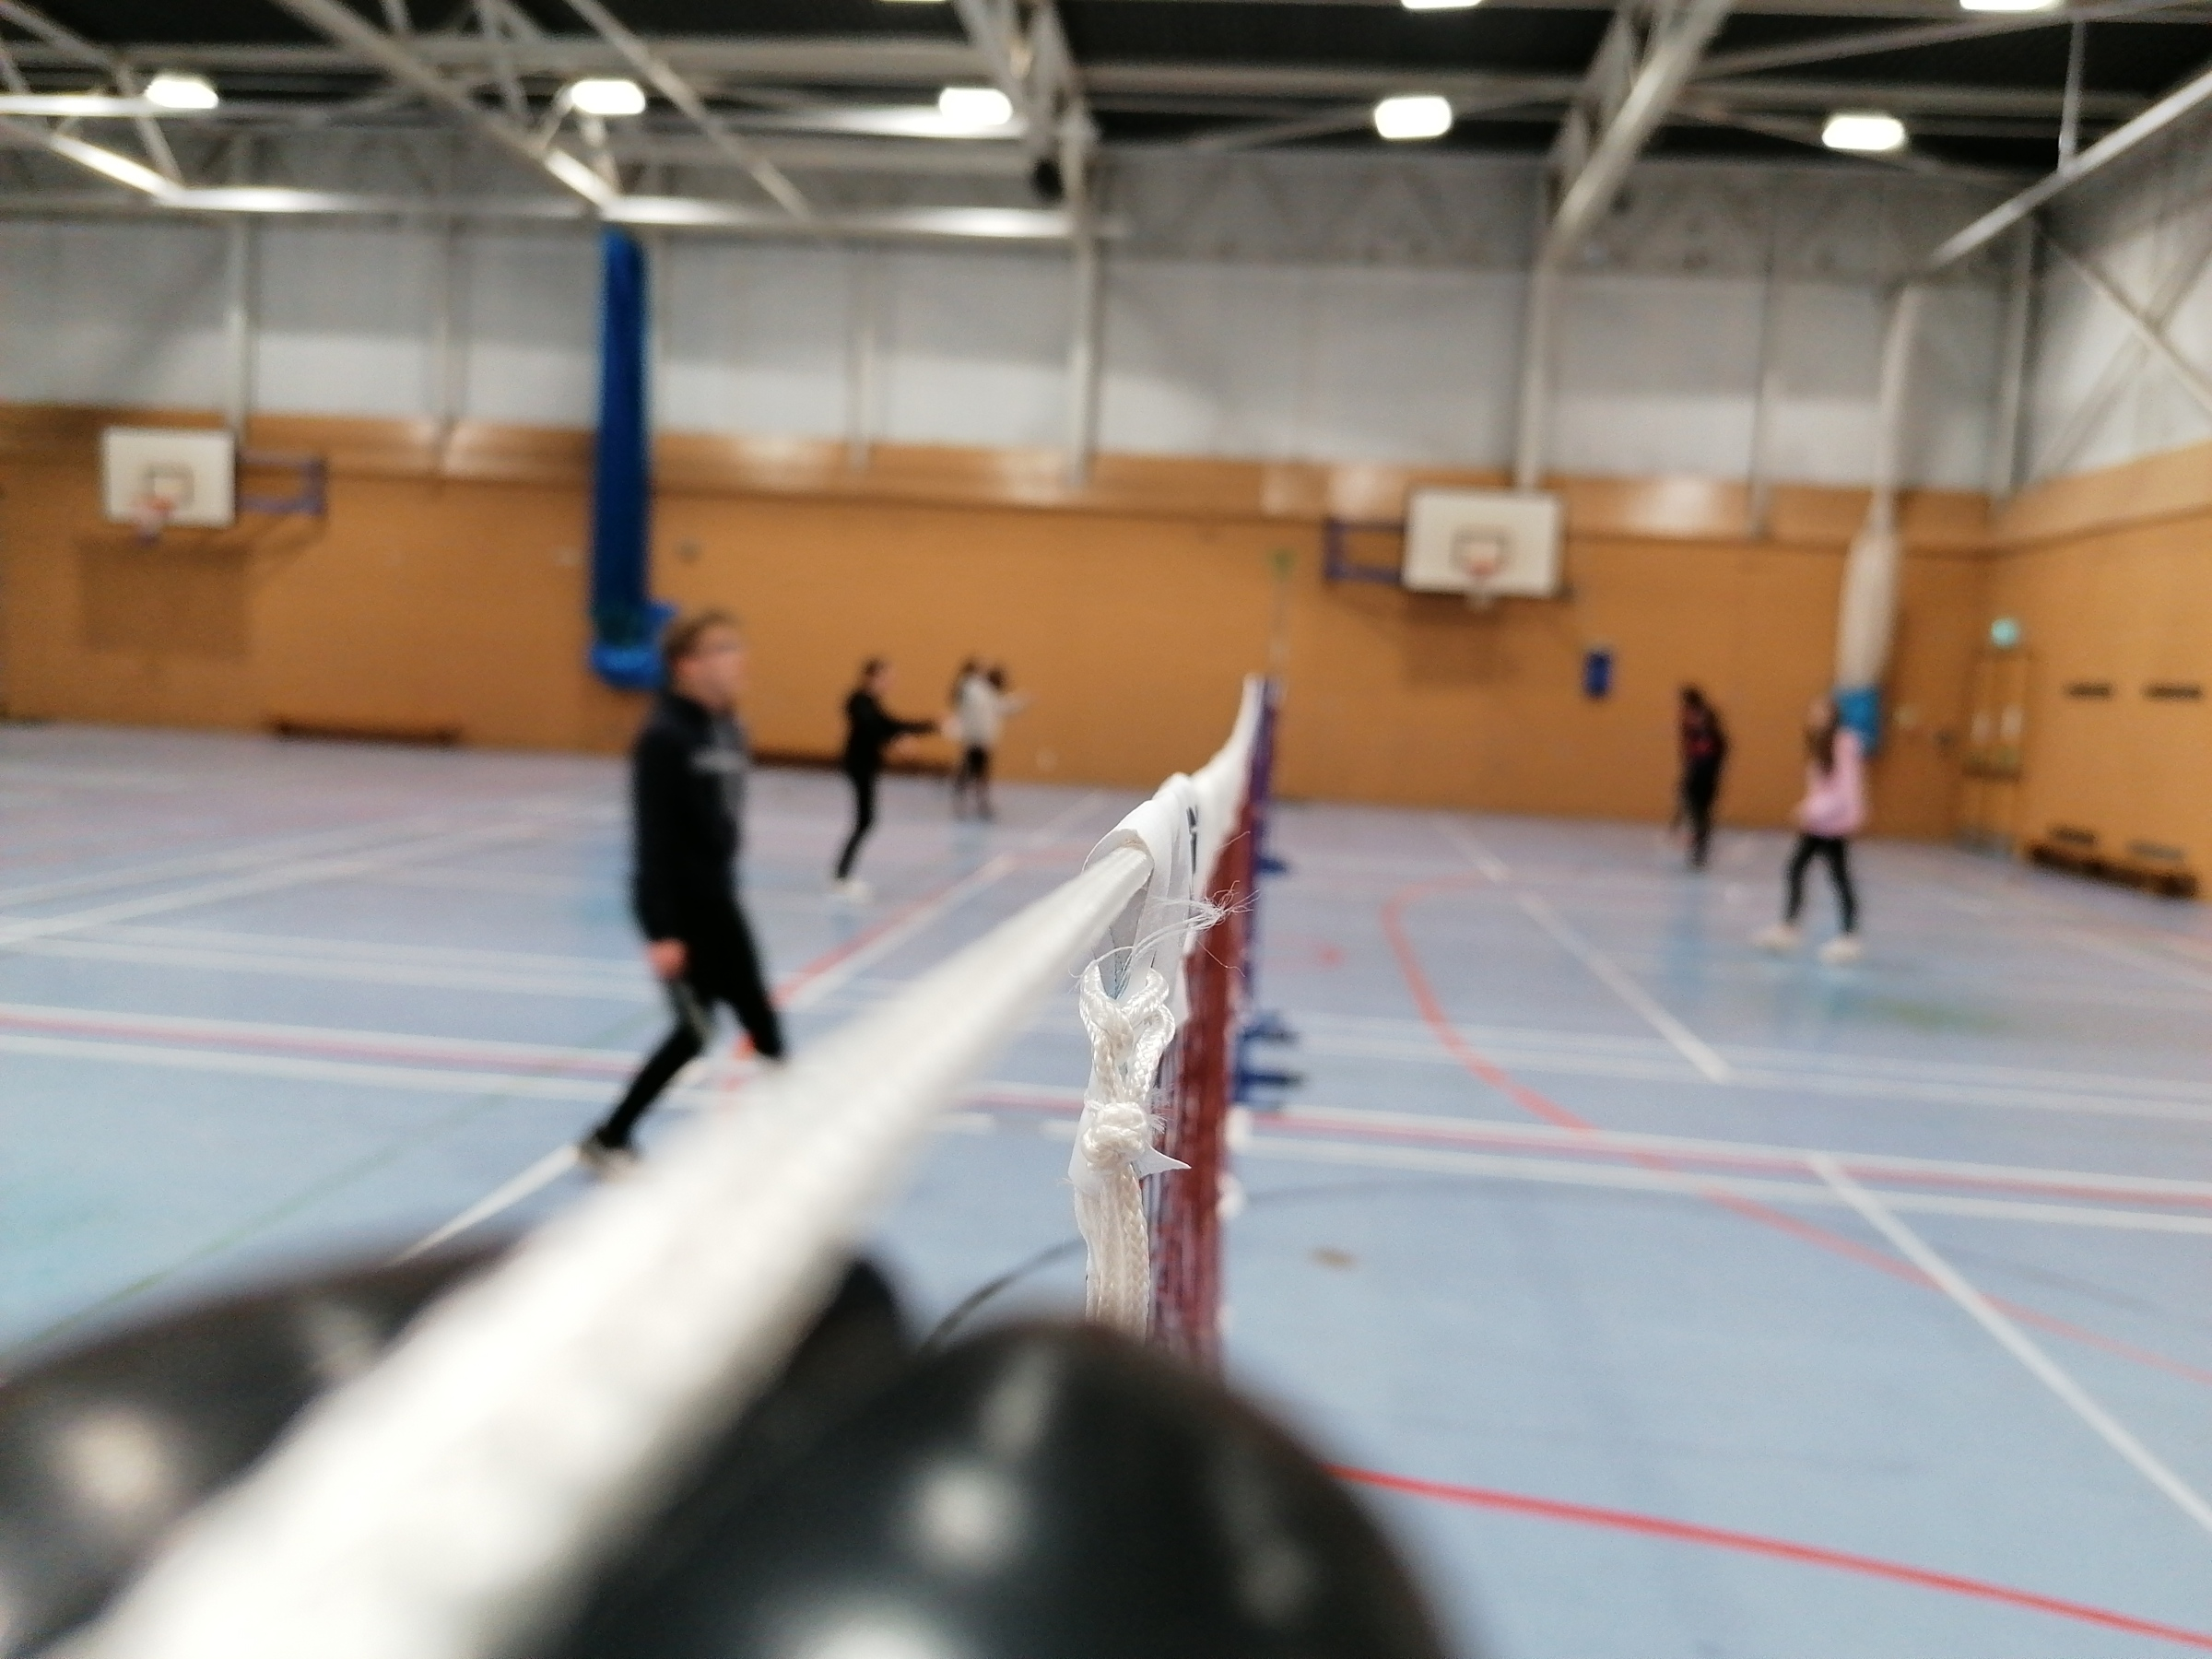 Broomfields Leisure Centre Junior Badminton Session